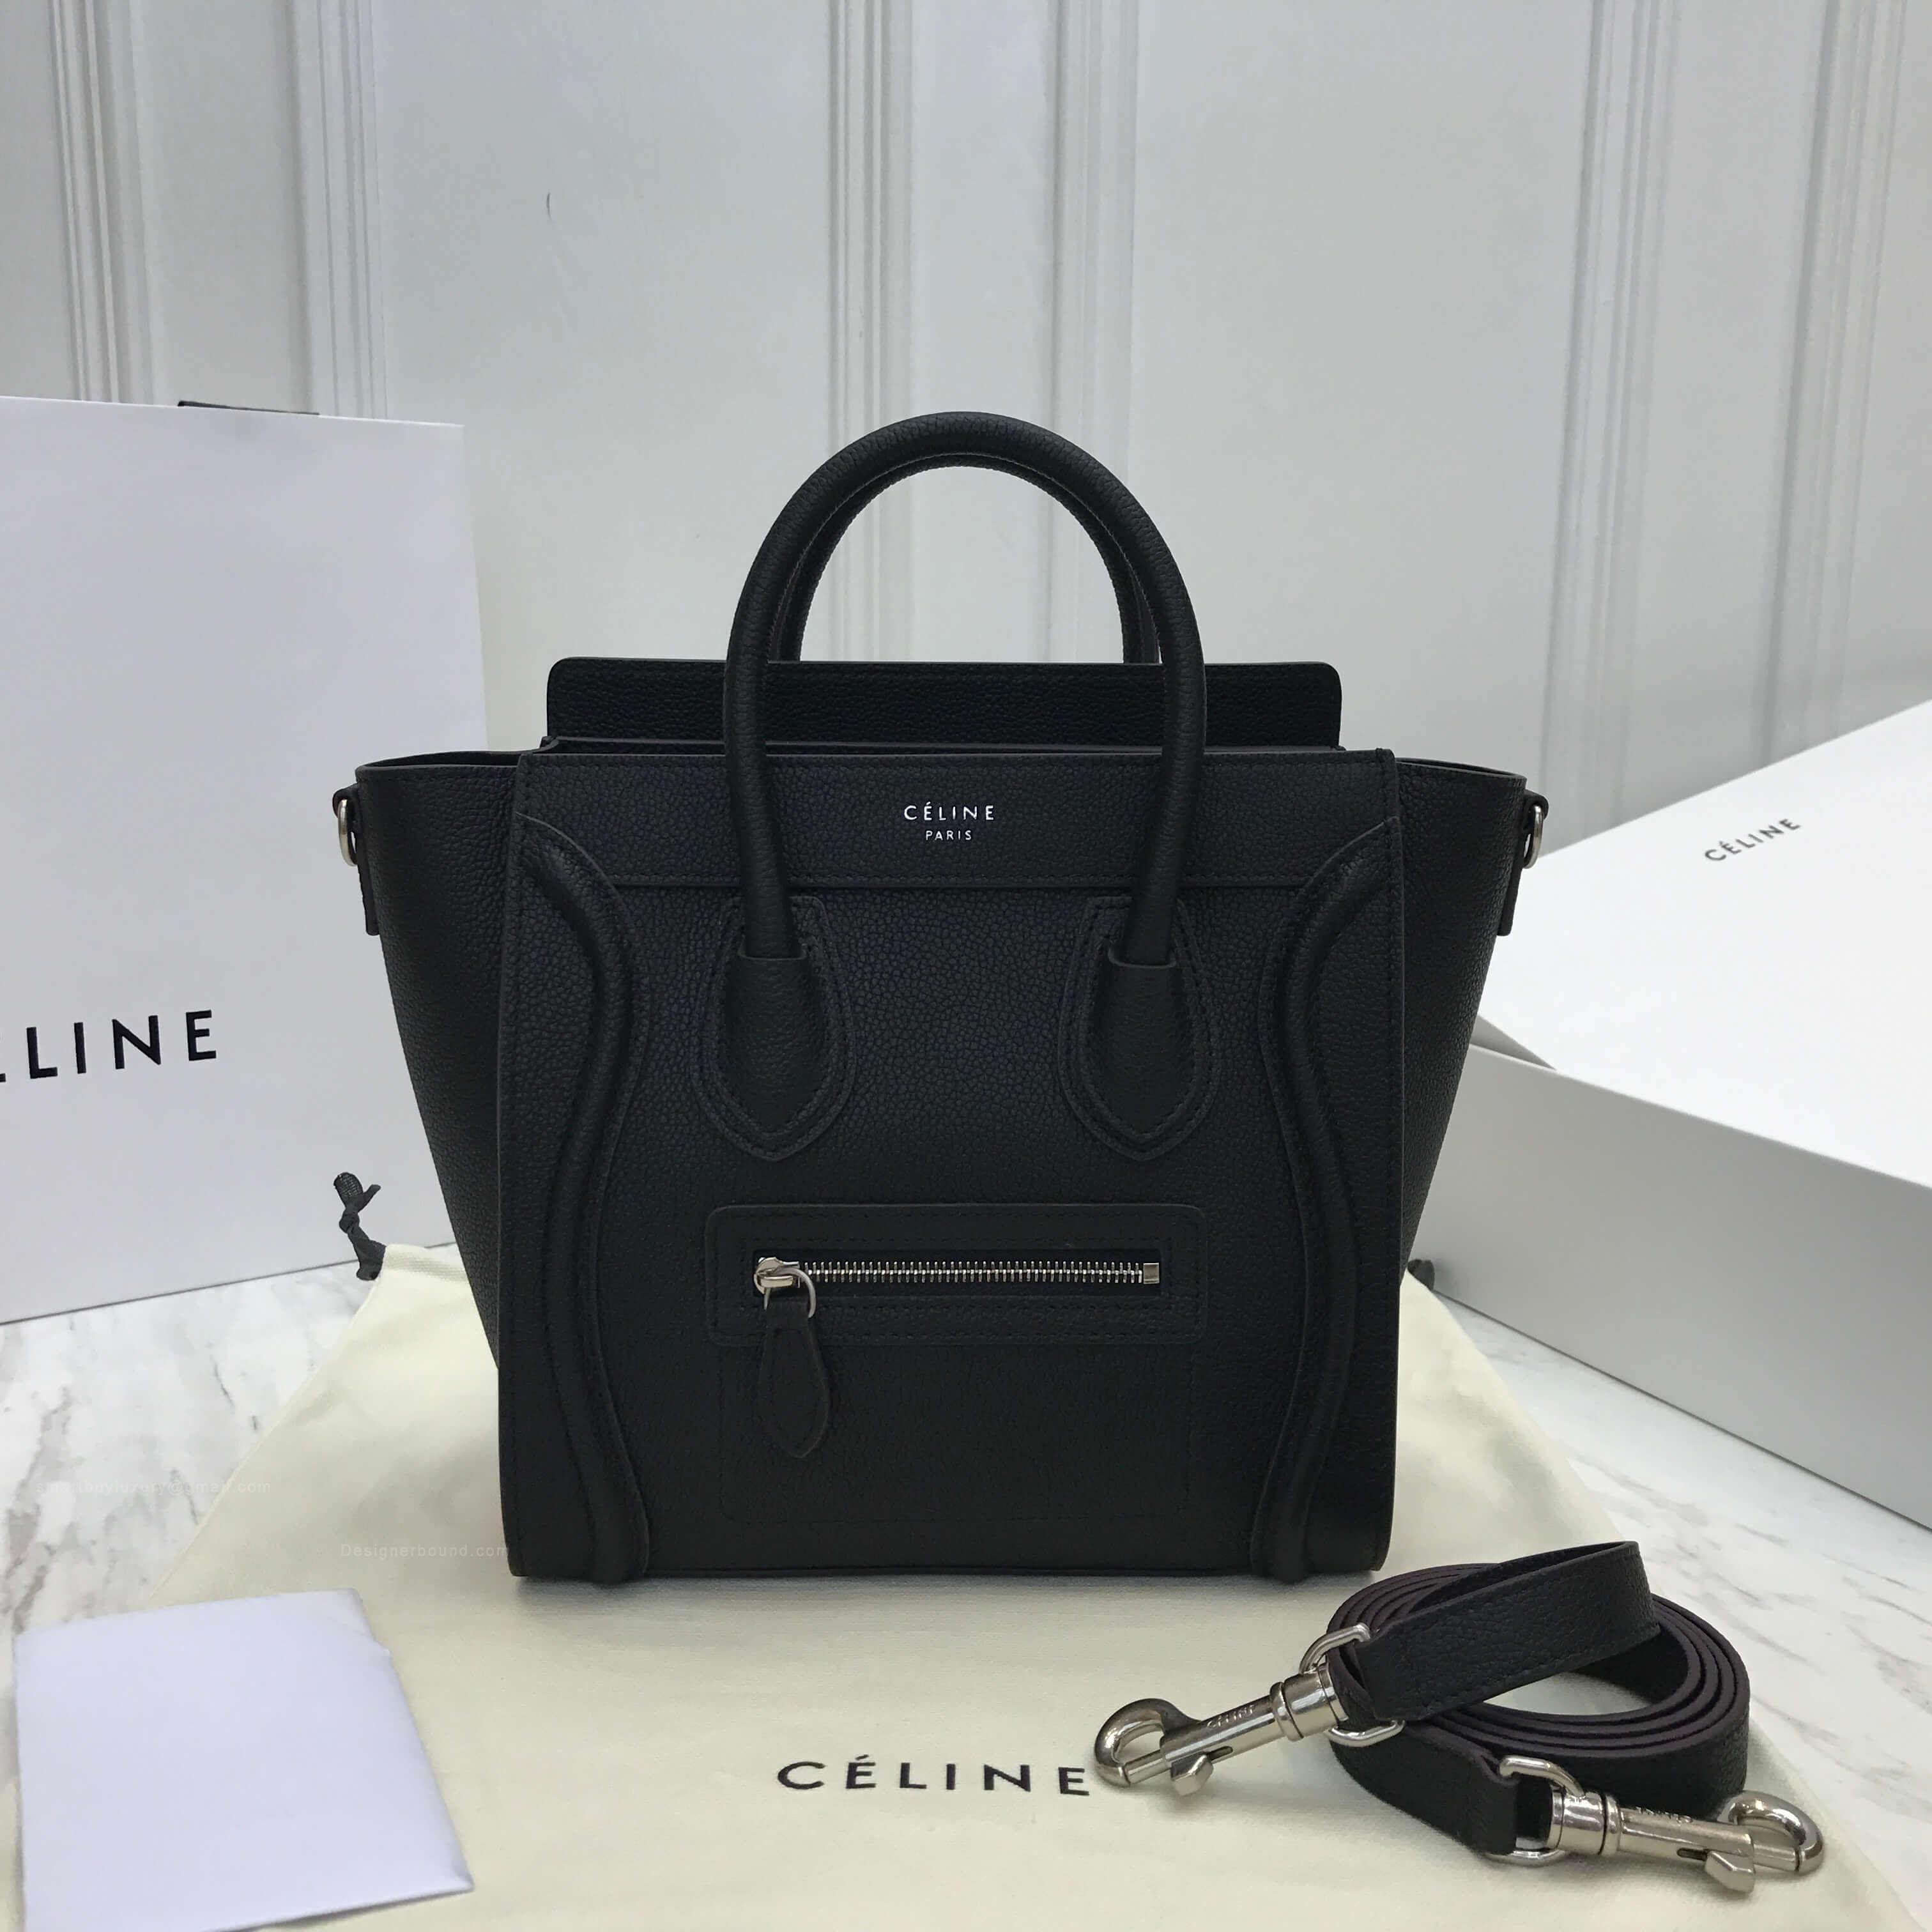 Celine Nano Luggage Handbag in Black Grained Calfskin SHW d5bec9de0a669